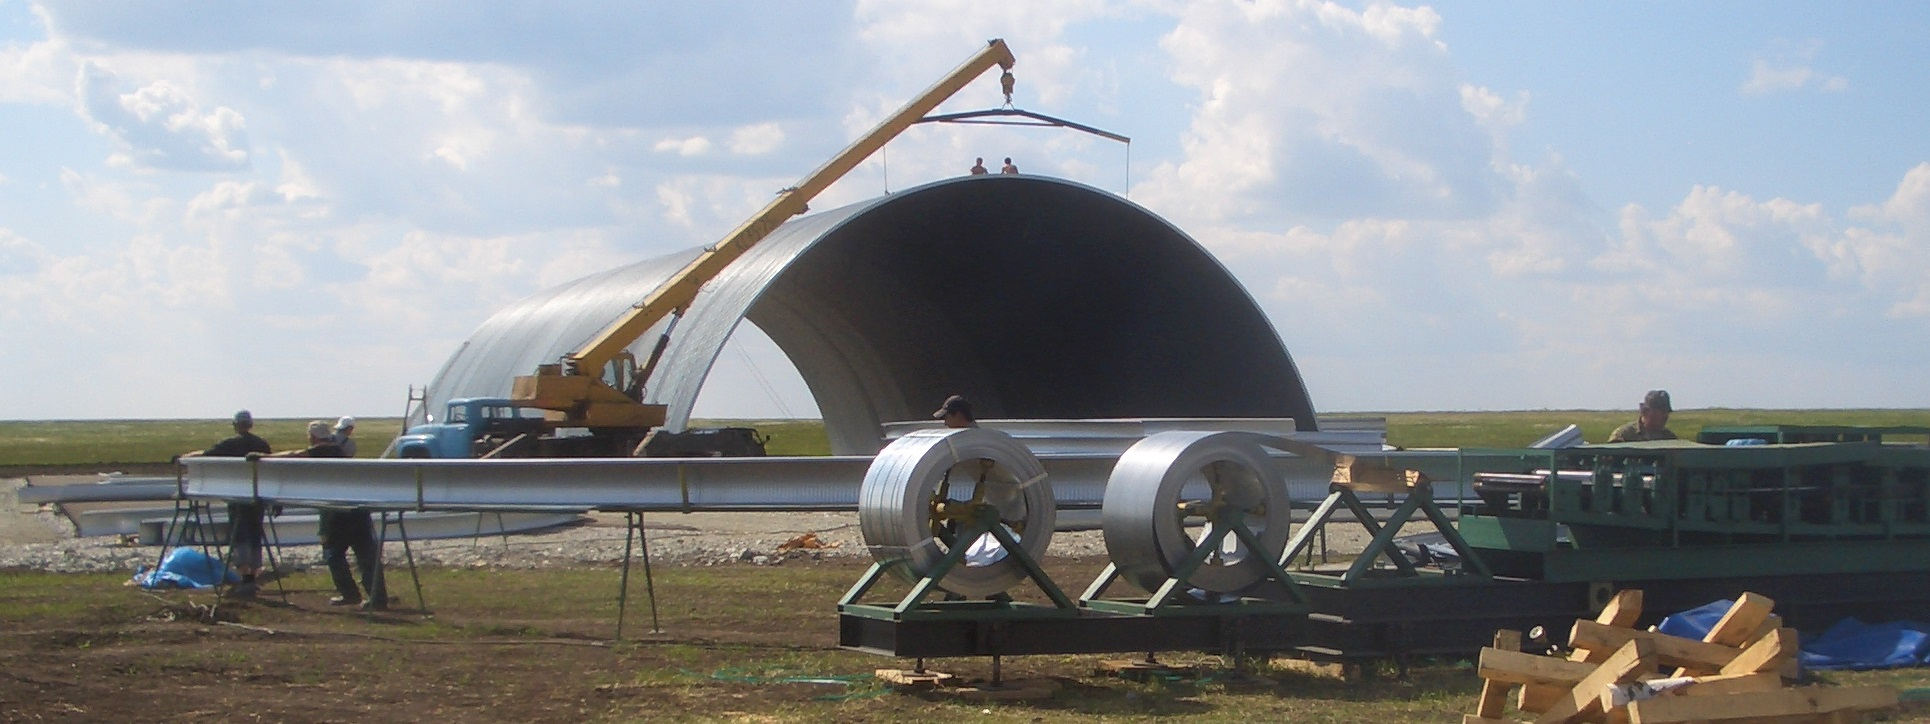 Строительство бескаркасного арочного ангара